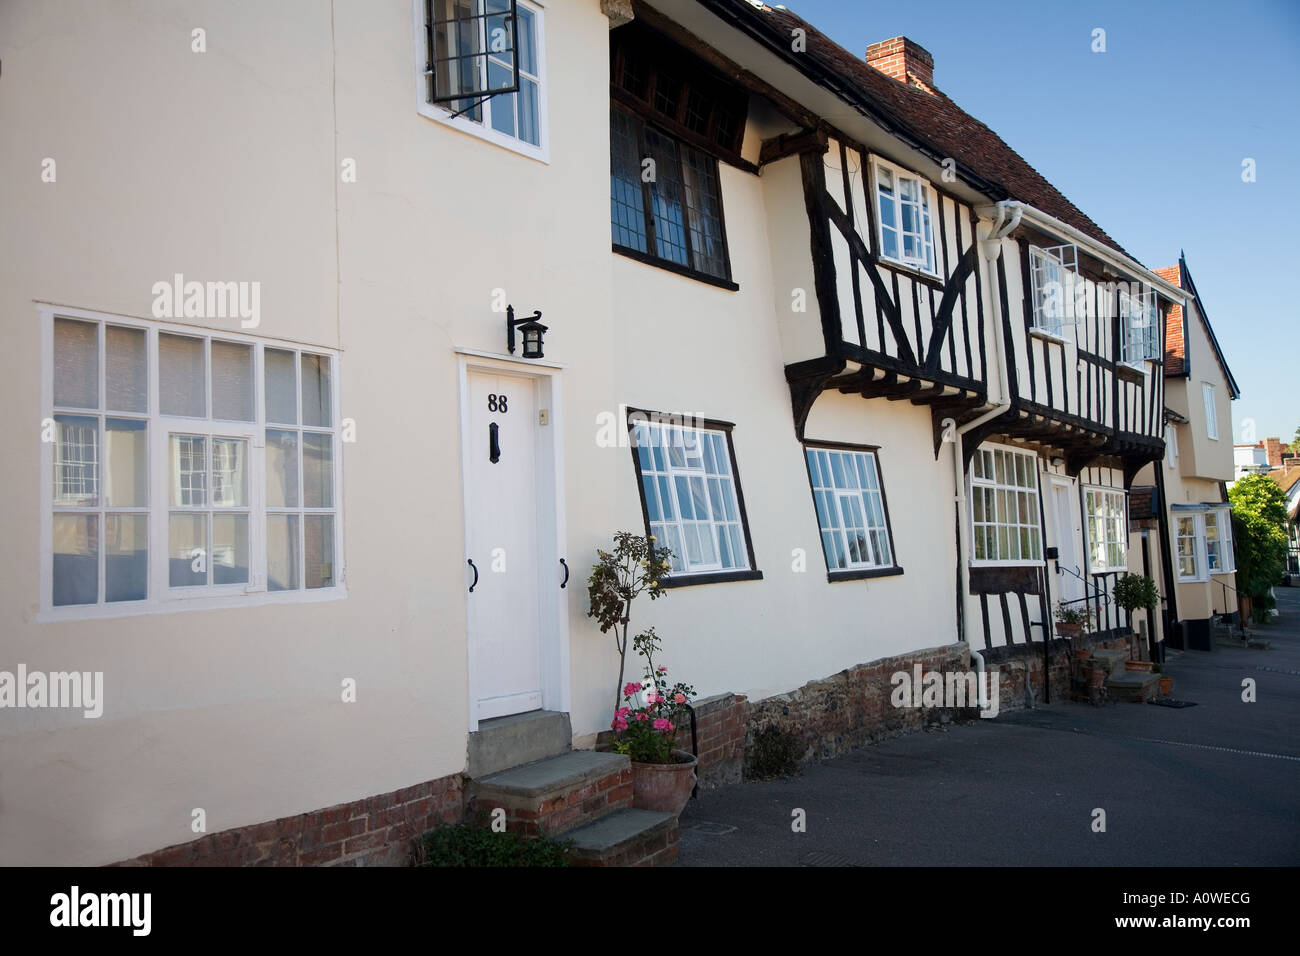 Lavenham street scene, Suffolk. - Stock Image